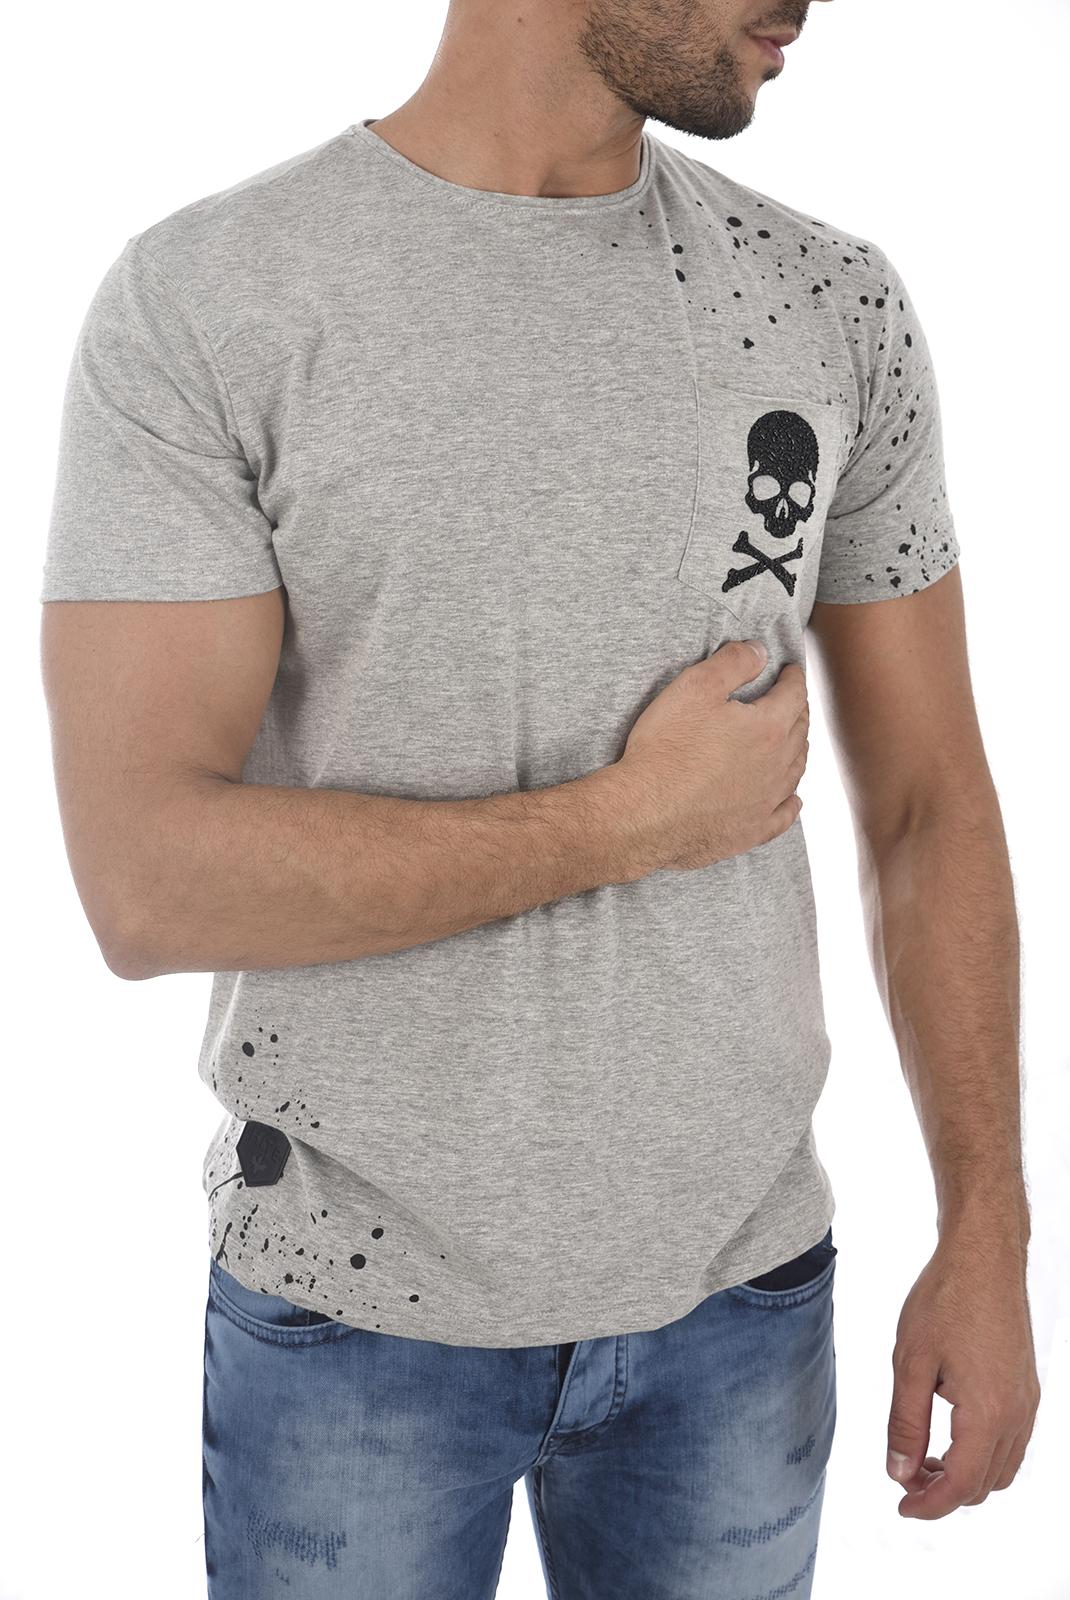 Tee-shirts  Hite couture MAKER LT GREY MEL